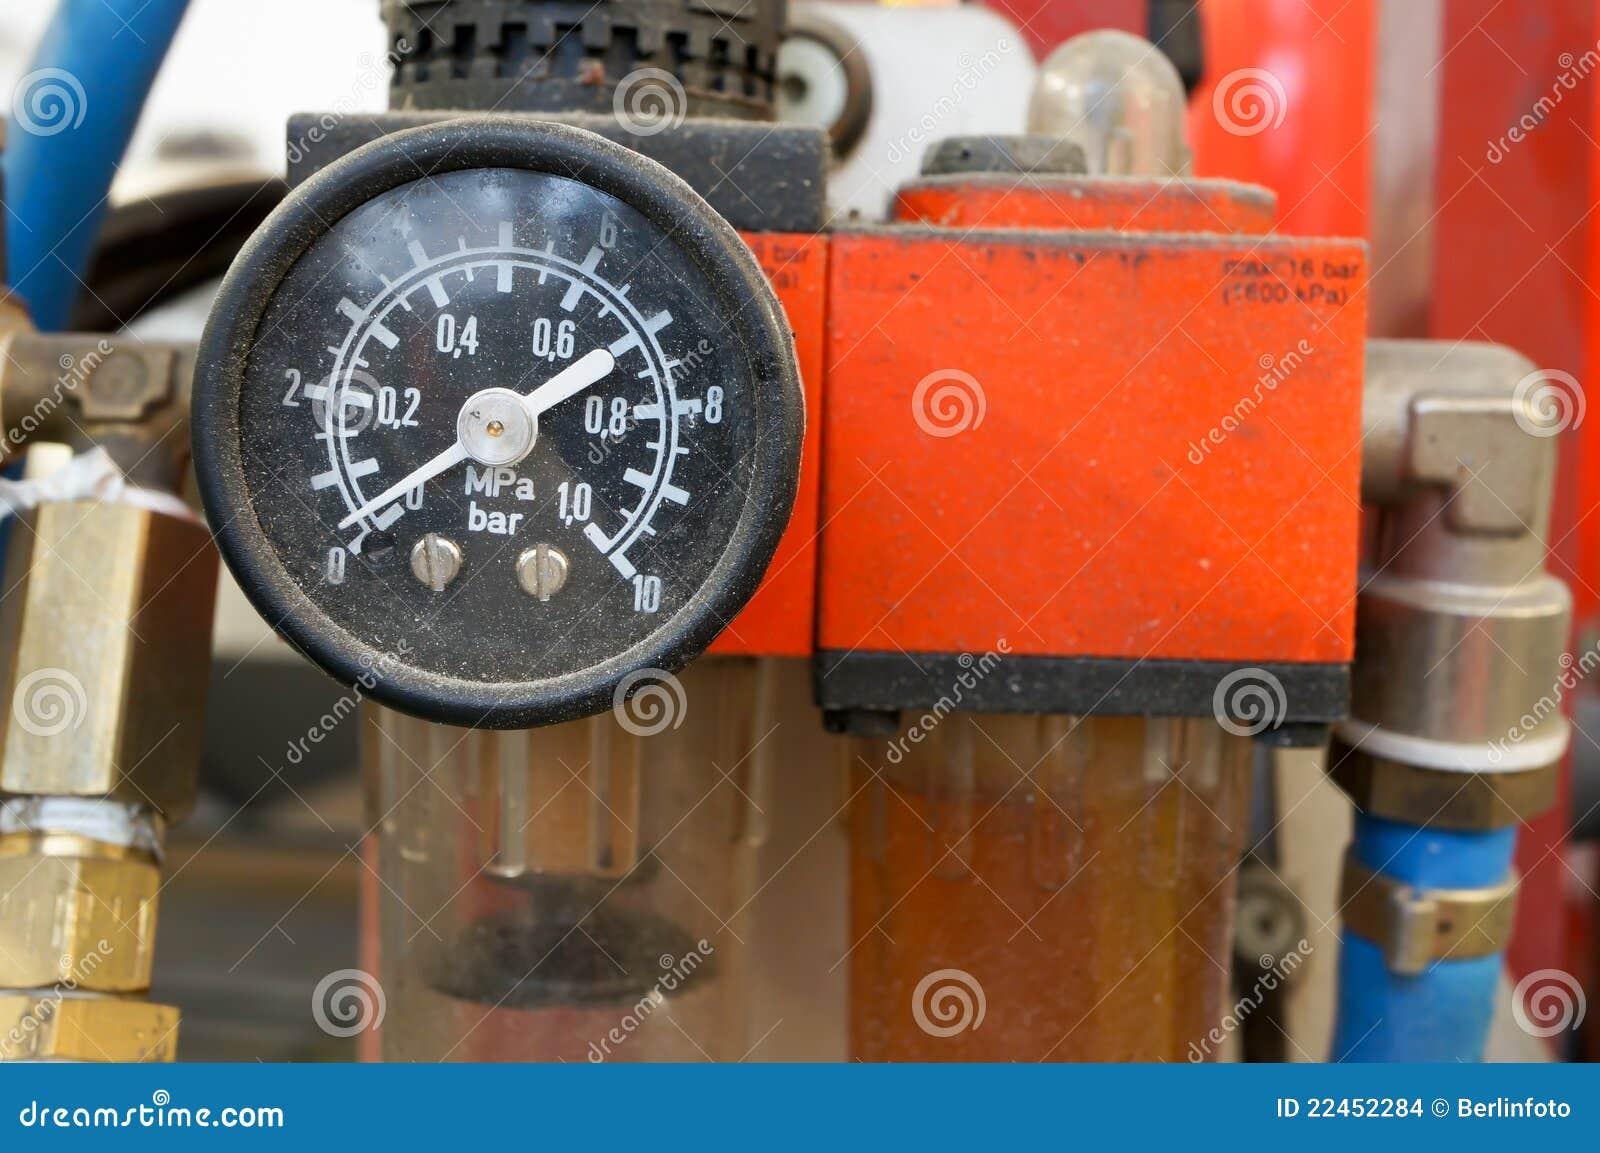 Car air pressure gauge stock photo  Image of machine - 22452284